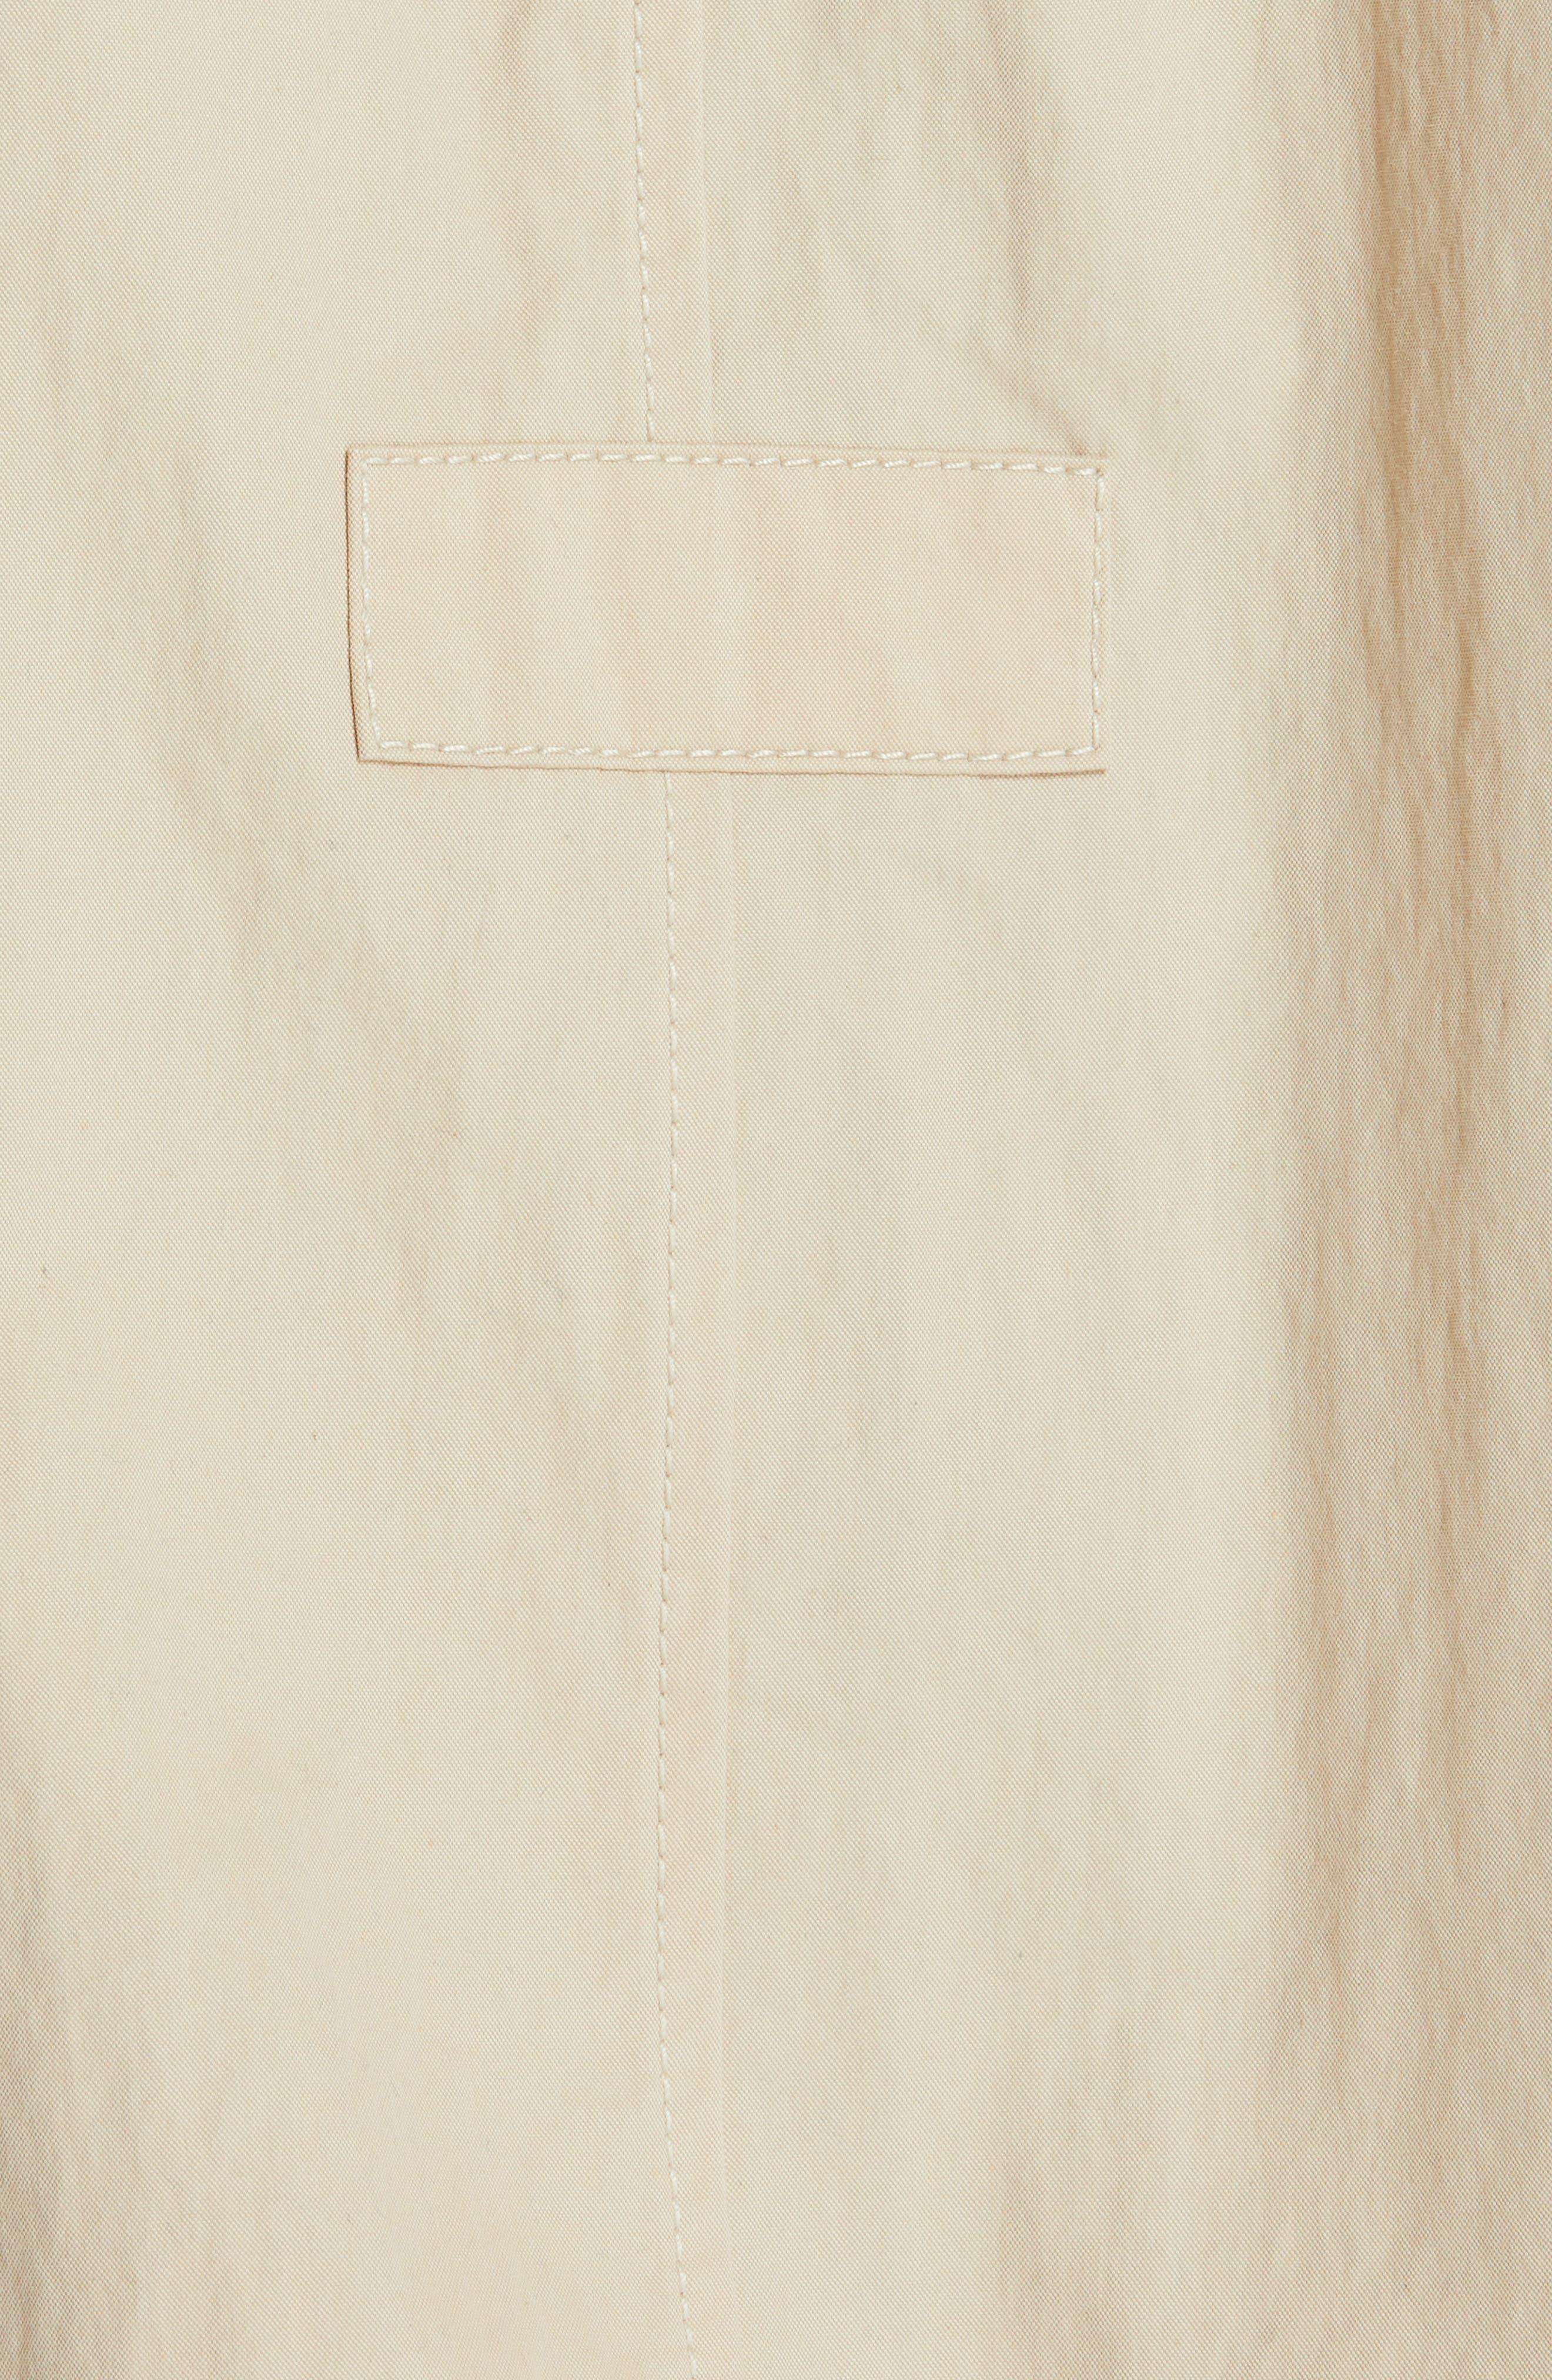 Cotton & Nylon Hooded Anorak,                             Alternate thumbnail 5, color,                             BUTTERMILK